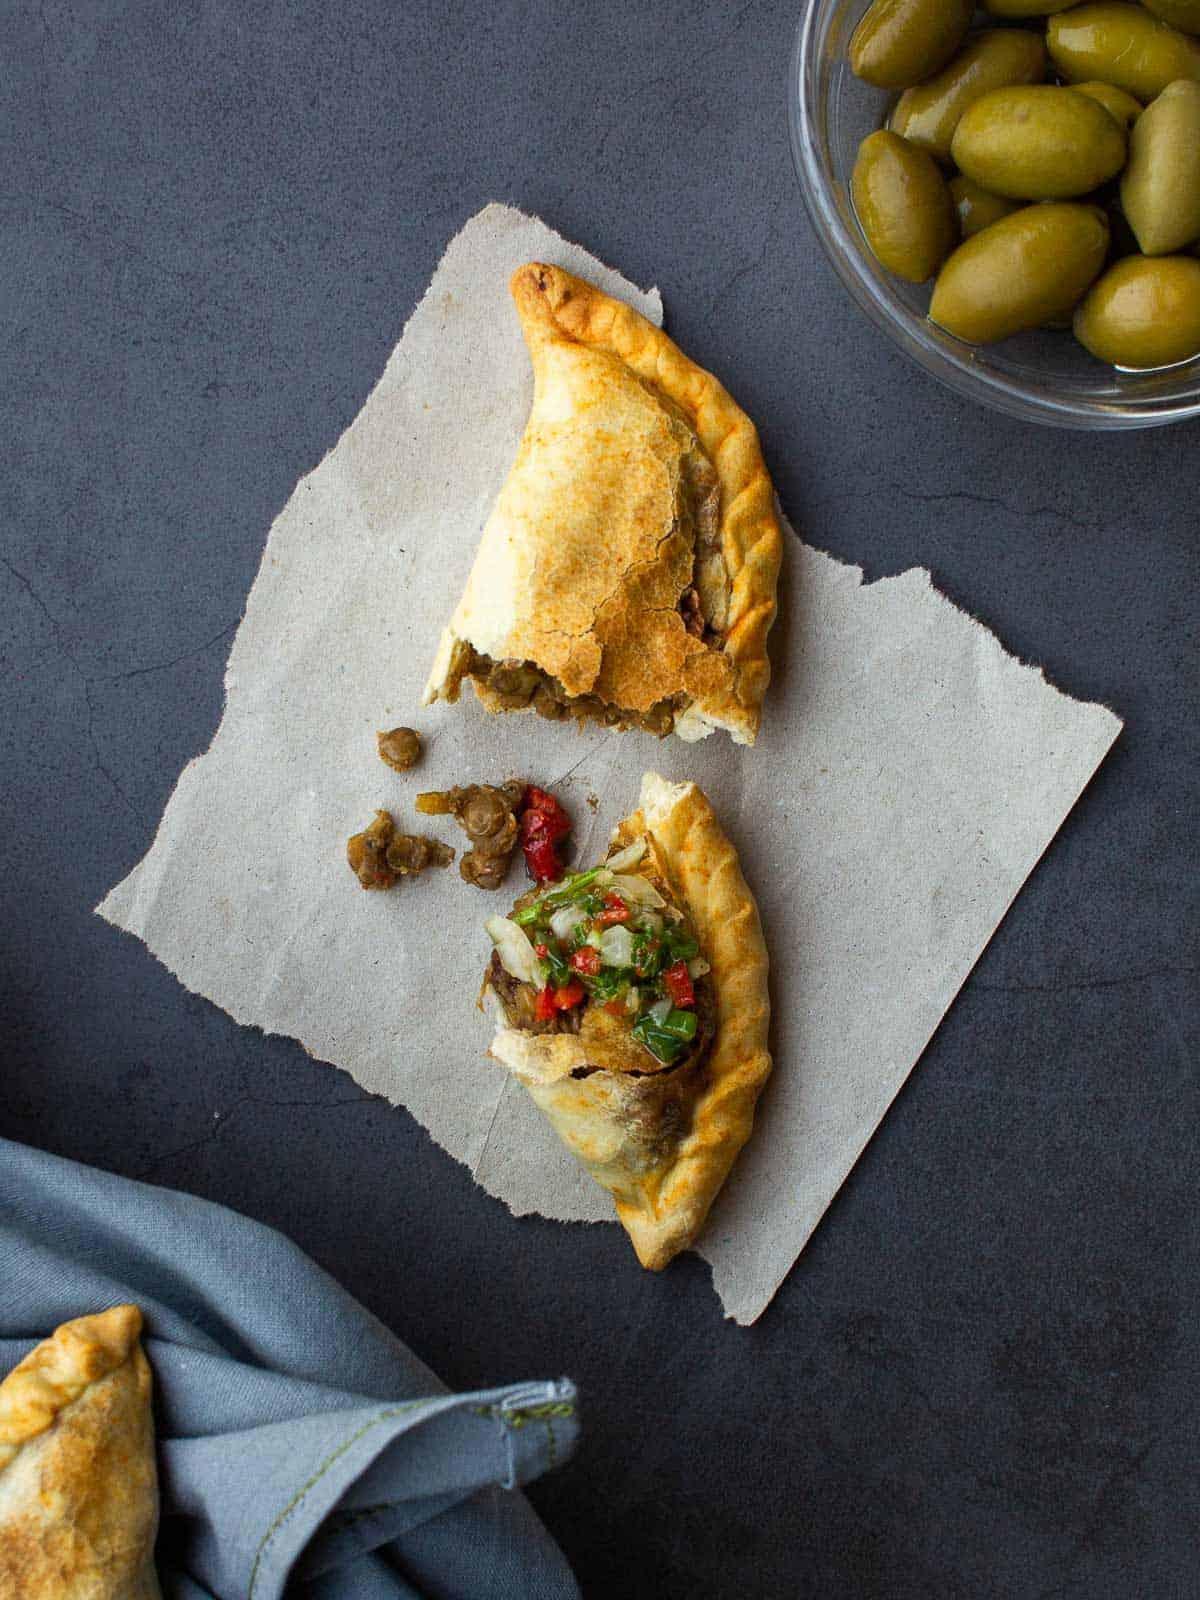 Halved Vegan Empanada